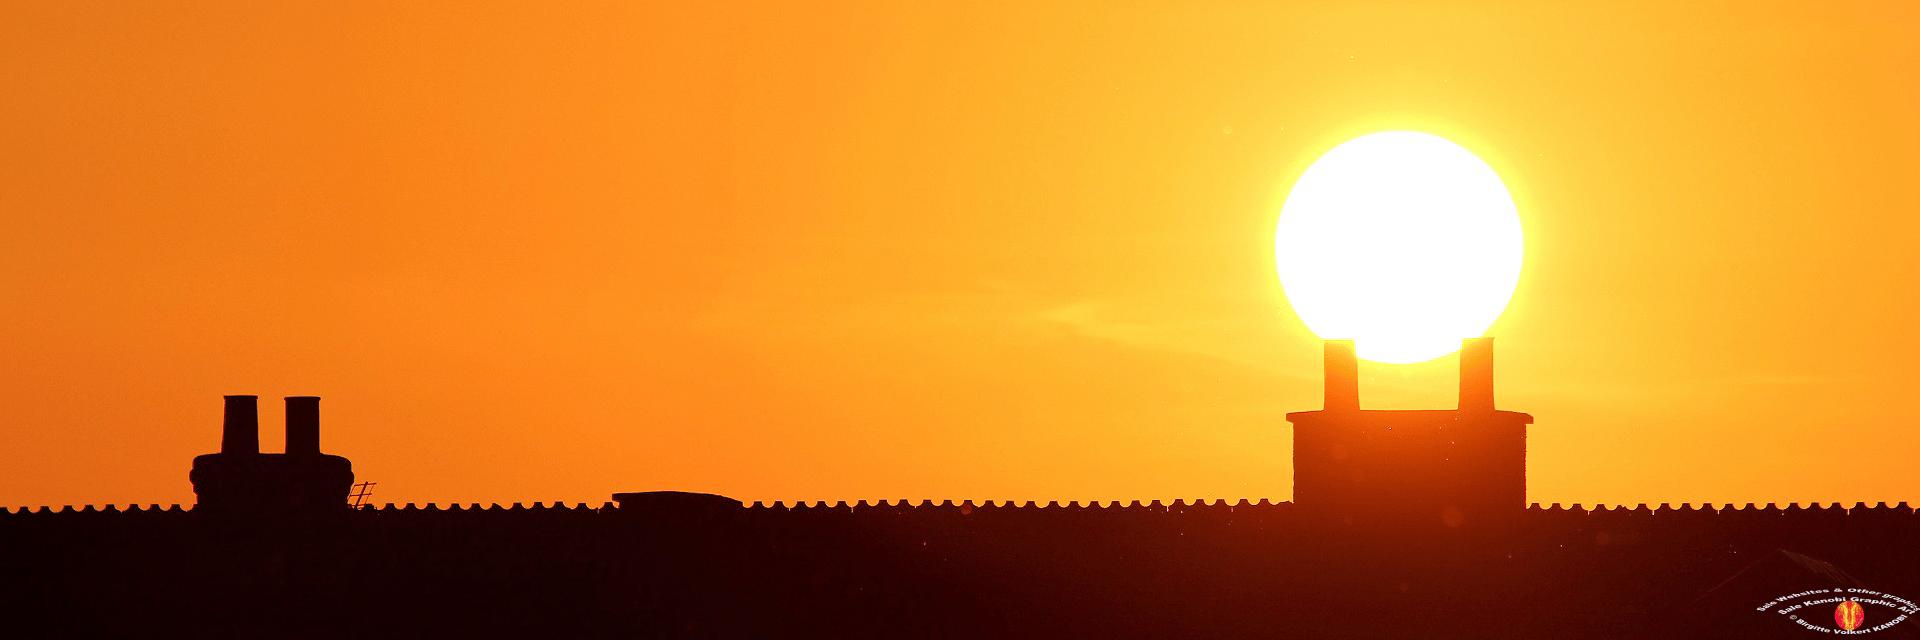 Link UK Farmer Shop sunlight ©Kanobi® (4)